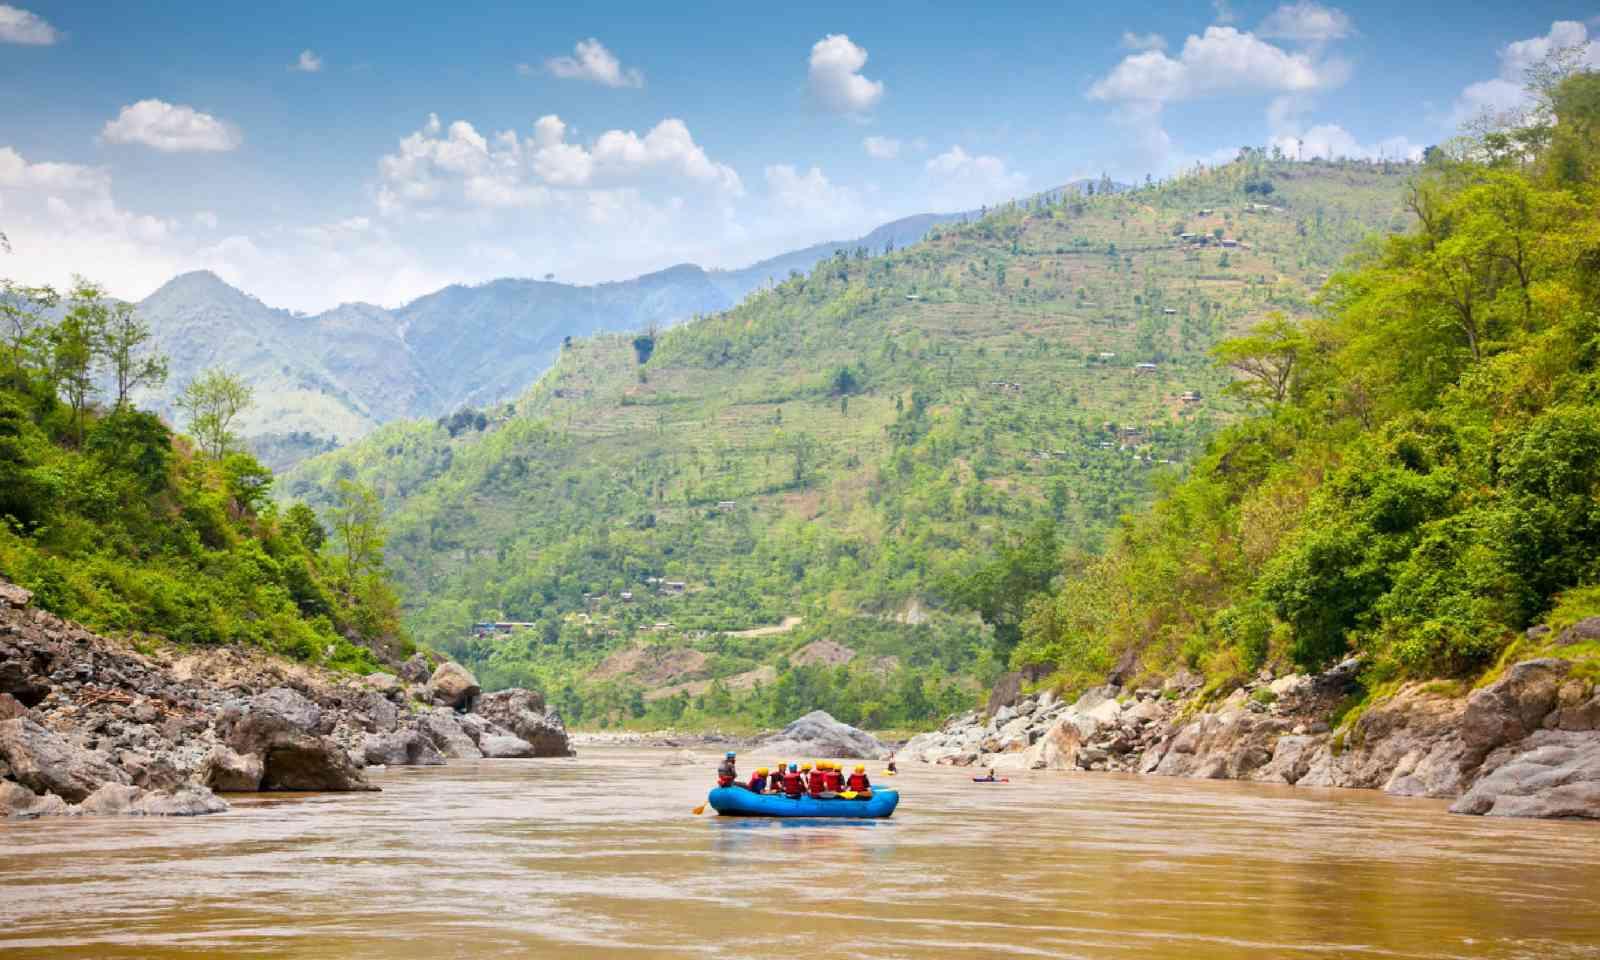 Rafting on the Bhote Kosi (Shutterstock)